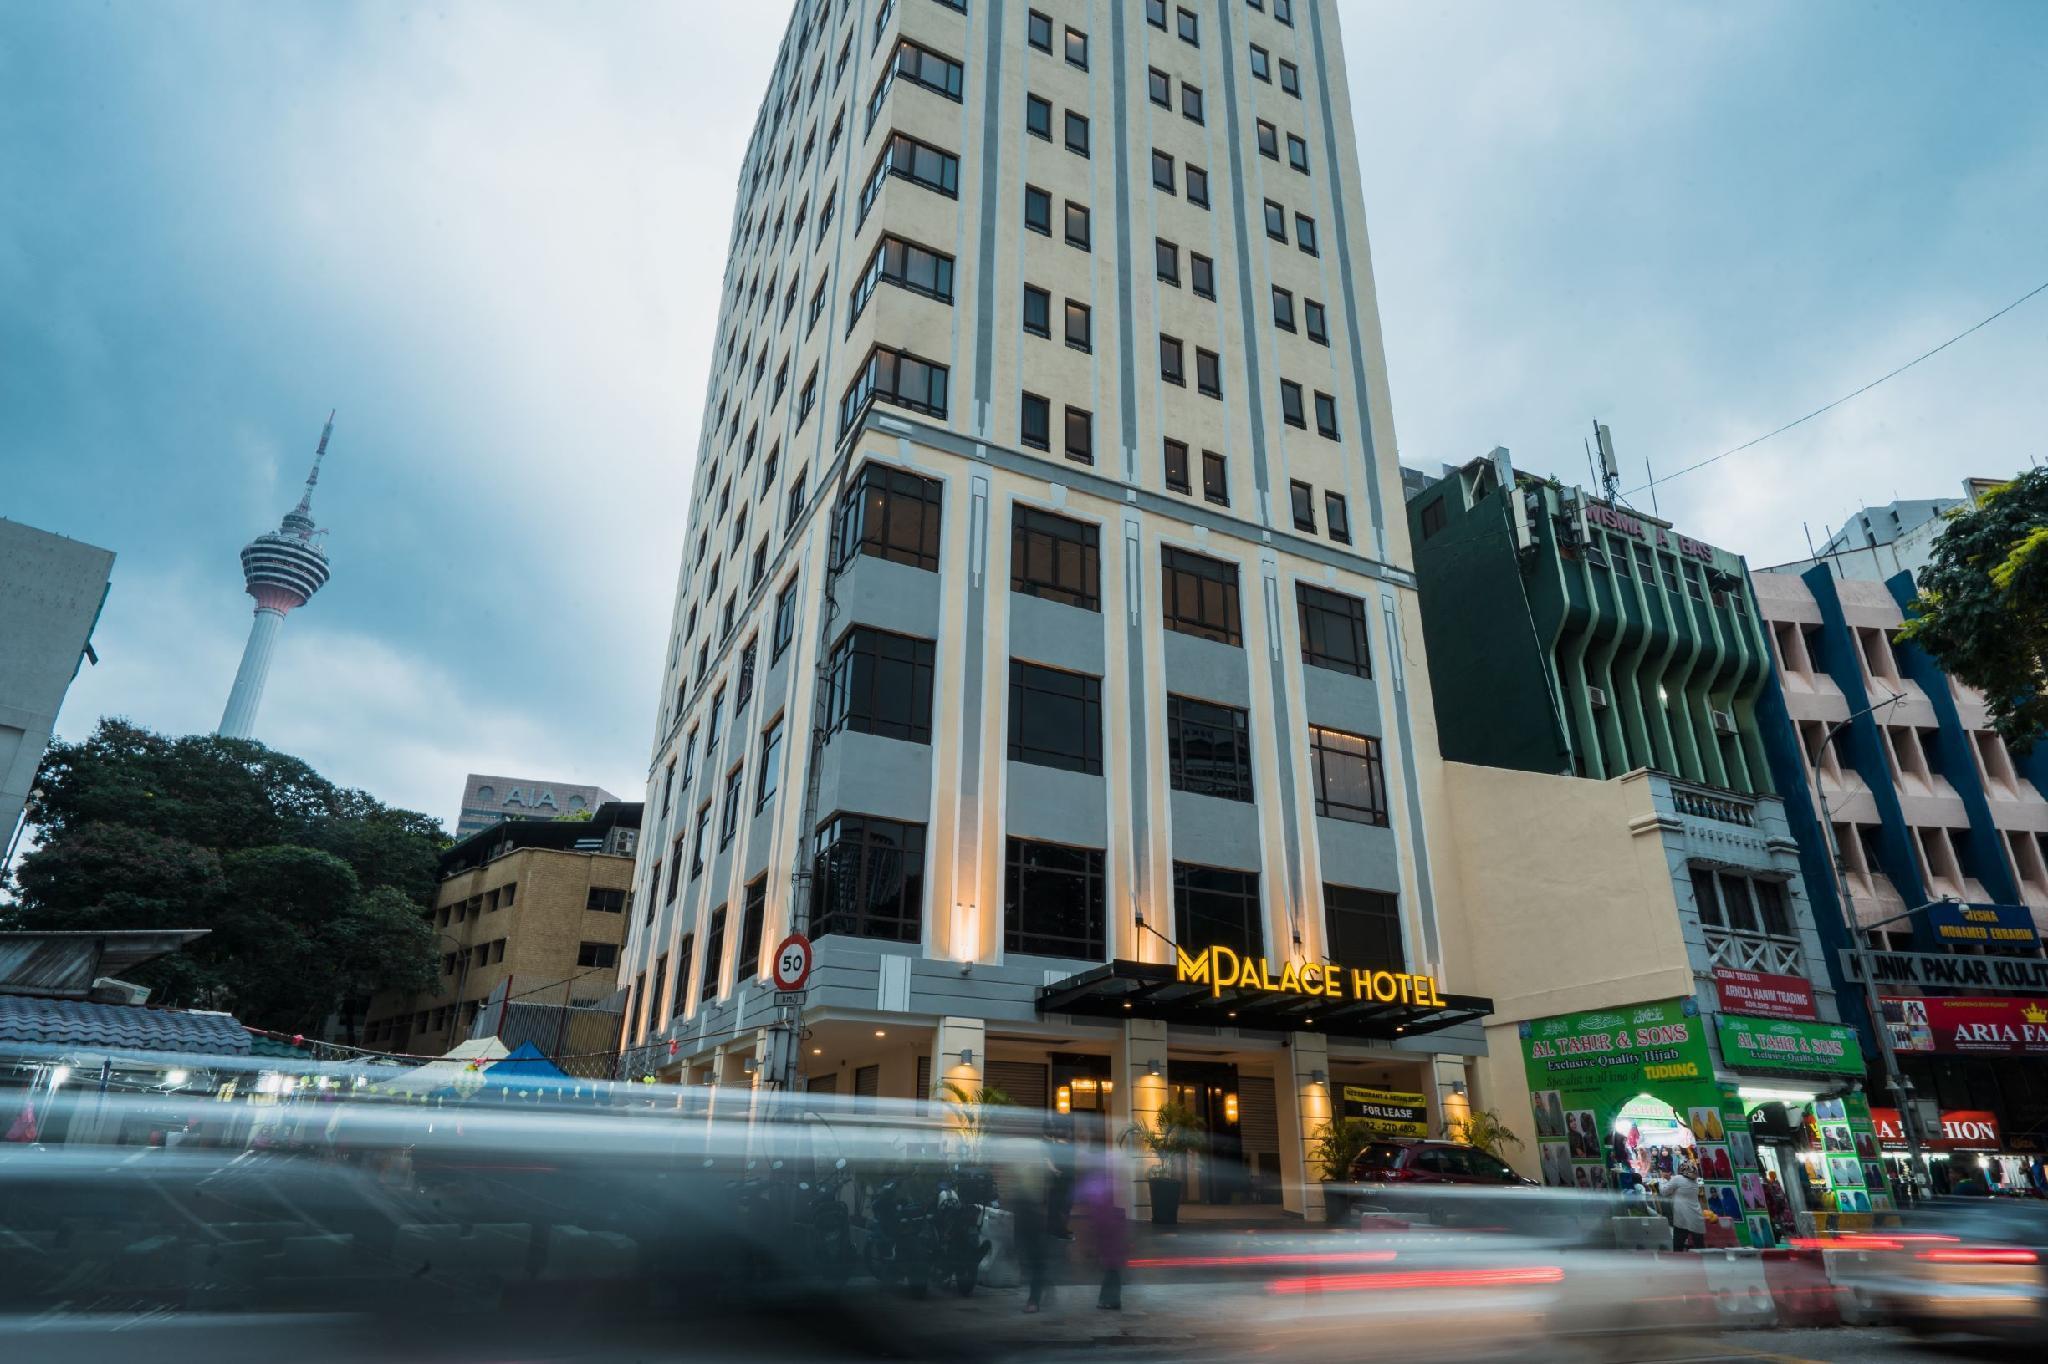 Mpalace Hotel